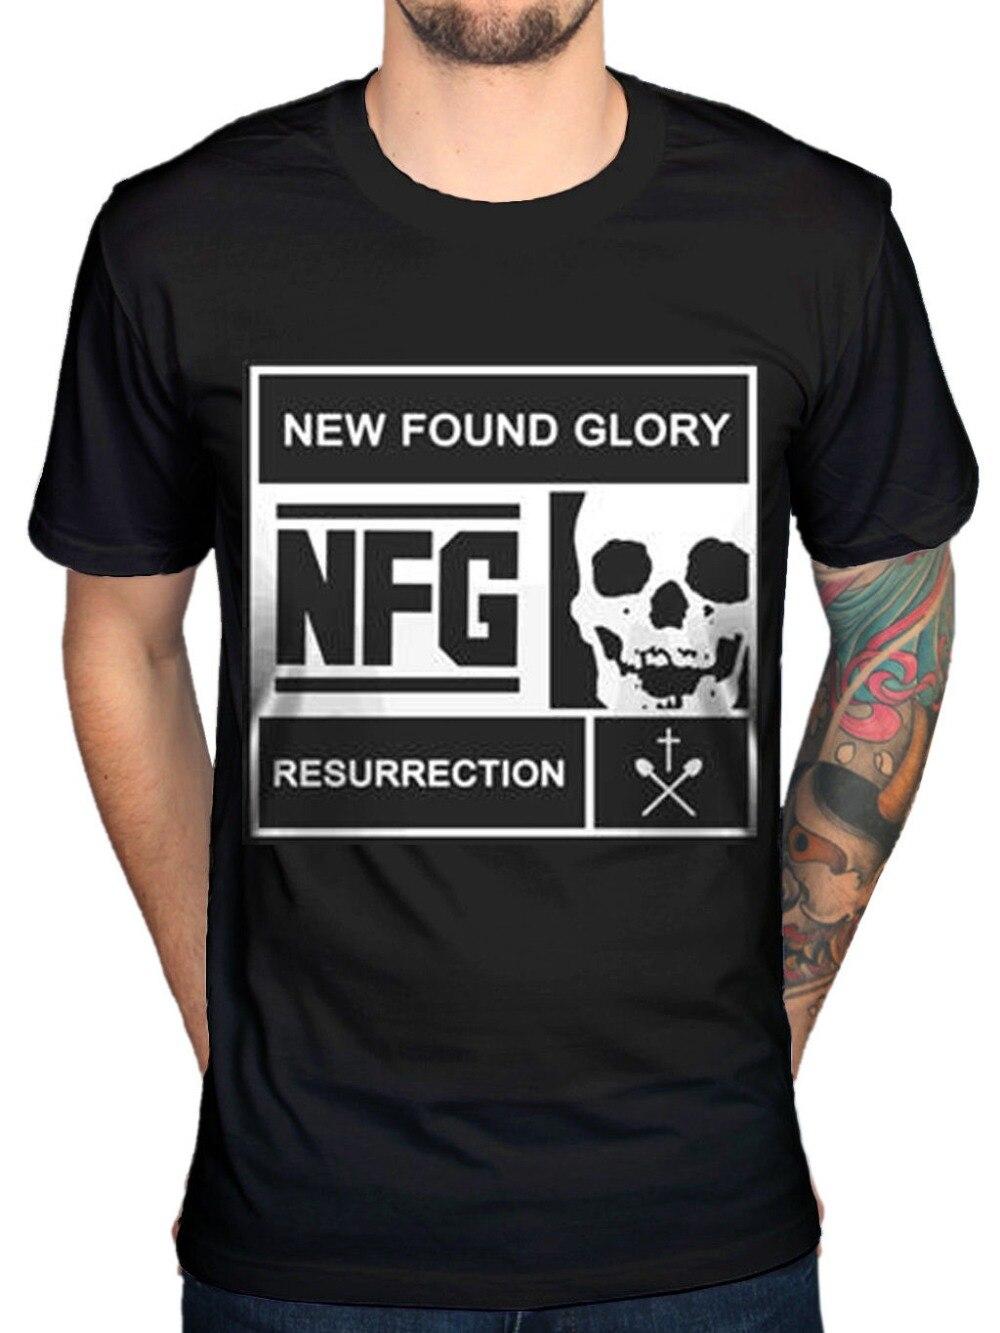 China Style Fashion New Found Glory Blocked Resurrection T-Shirt Merchandise Cotton Tee Shirts Short-sleeve Designer shirts